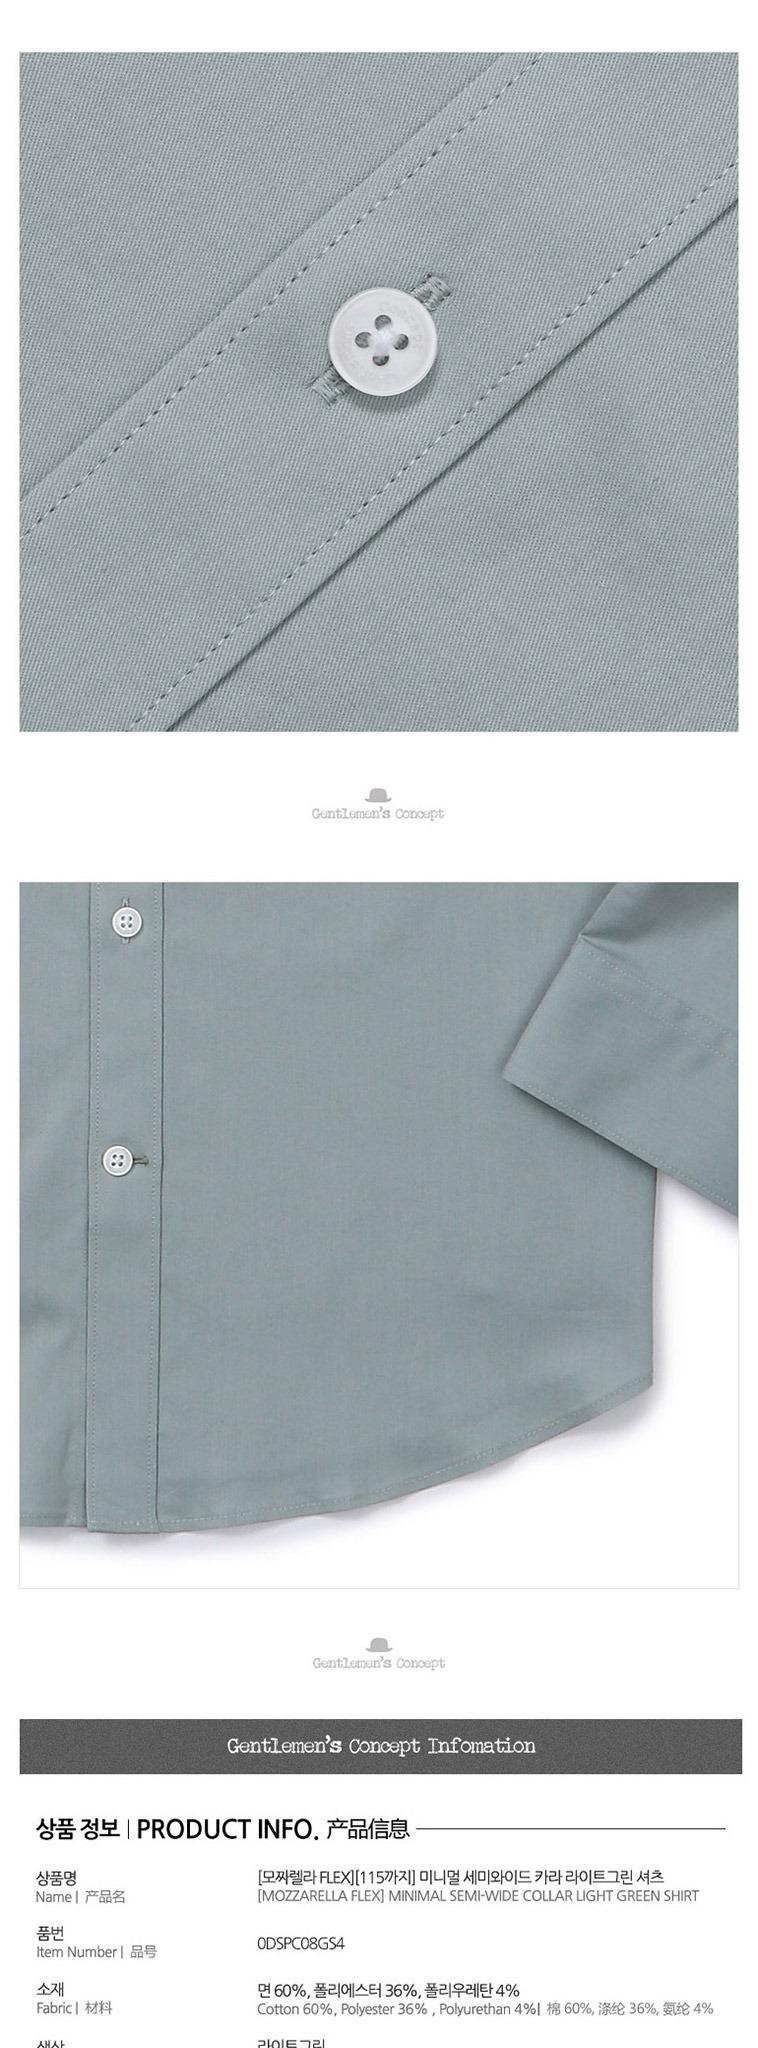 4cbf4510dae ... 투데이특가] 셔츠/와이셔츠 8종특가 - 상세정보 ...